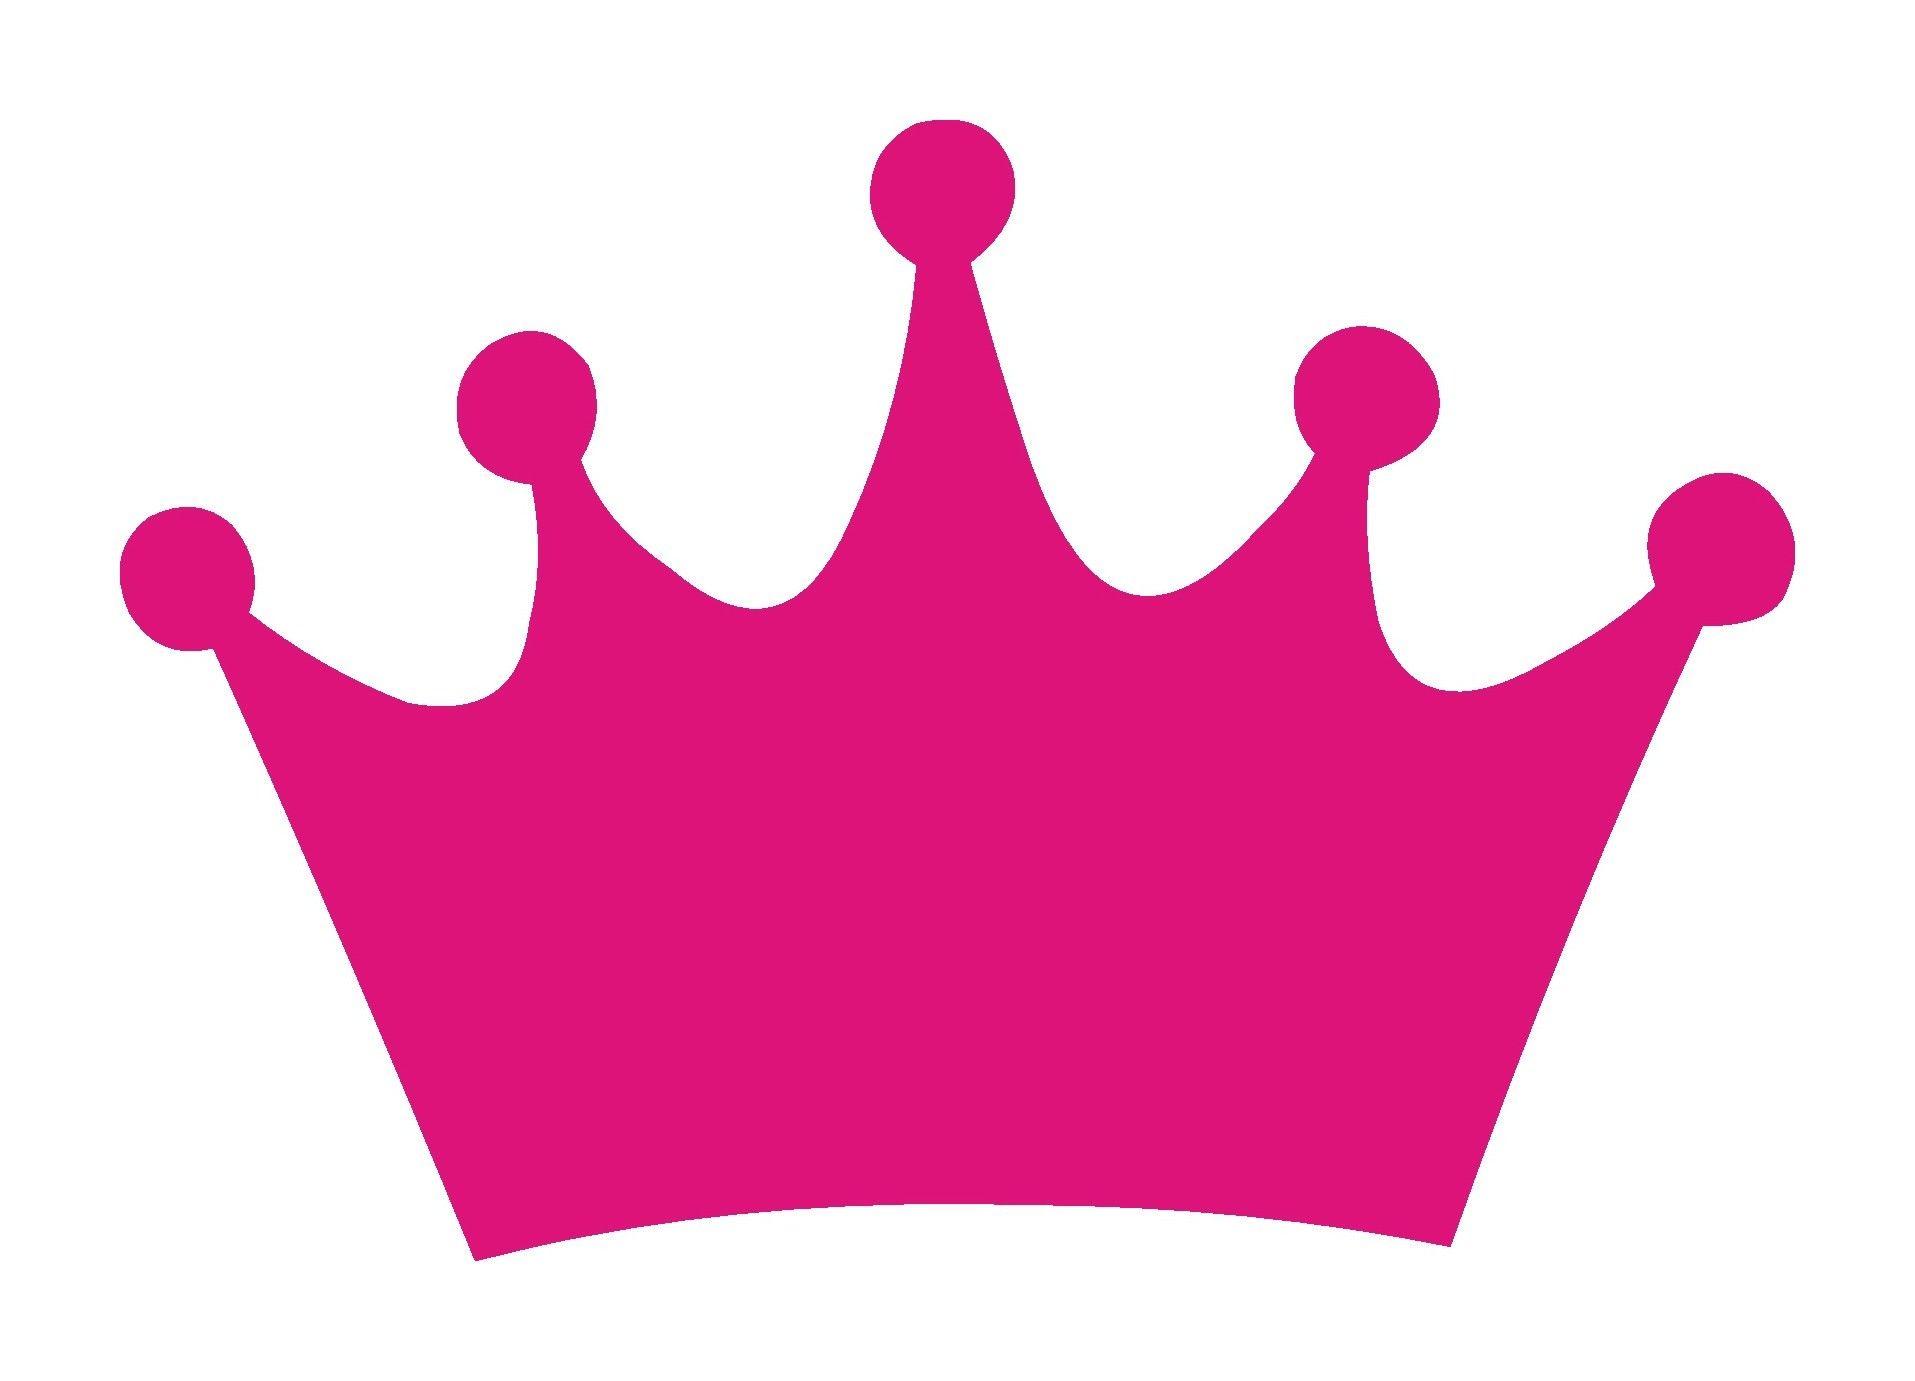 Pin By Melinda Williams On Melinda Wright Williams Jesus Free Clip Art Crown Clip Art Crown Silhouette